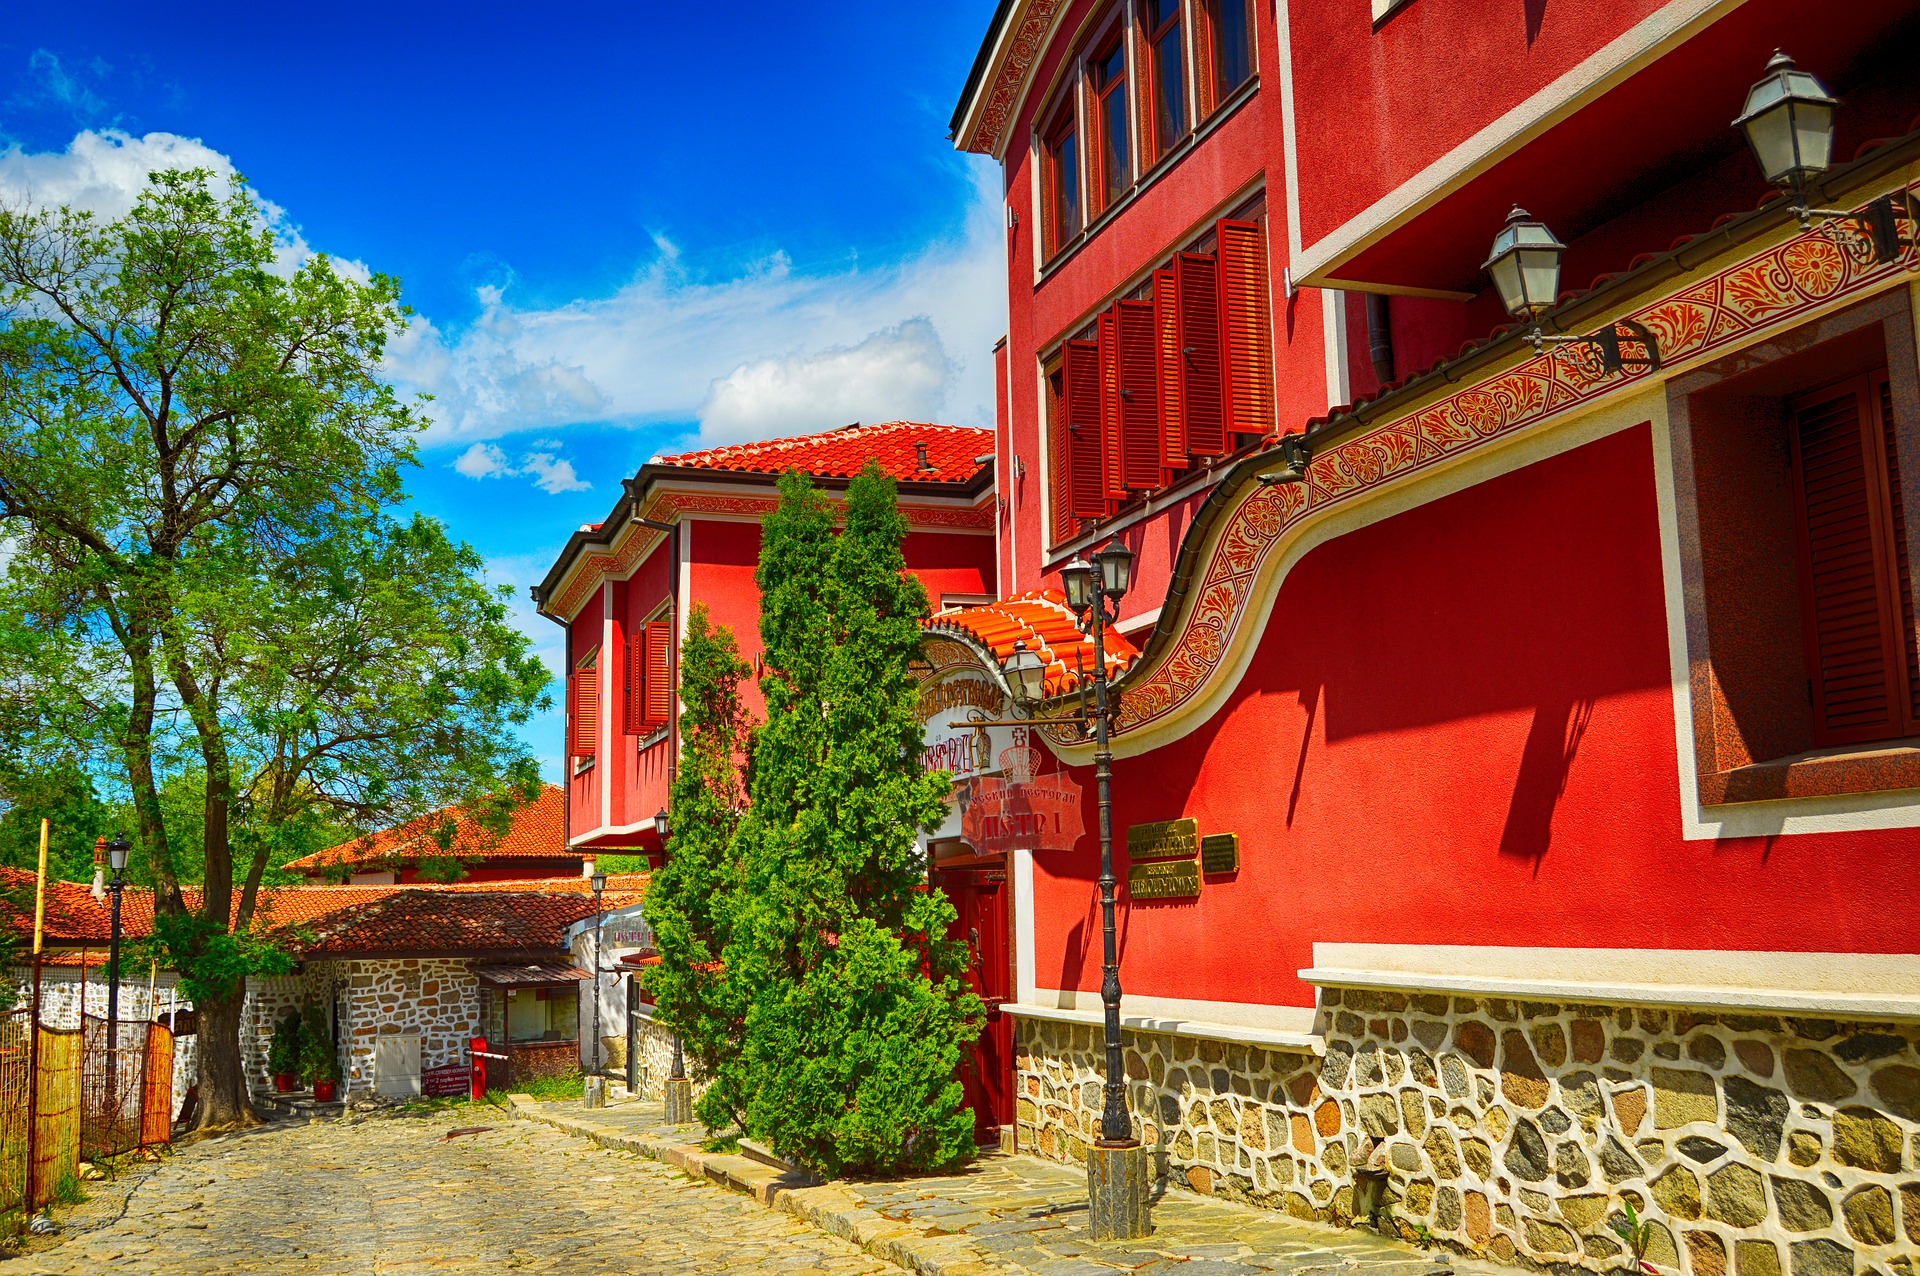 Plovdiv, Bulgaria: Europe's Oldest Inhabited City 4-days, including flights